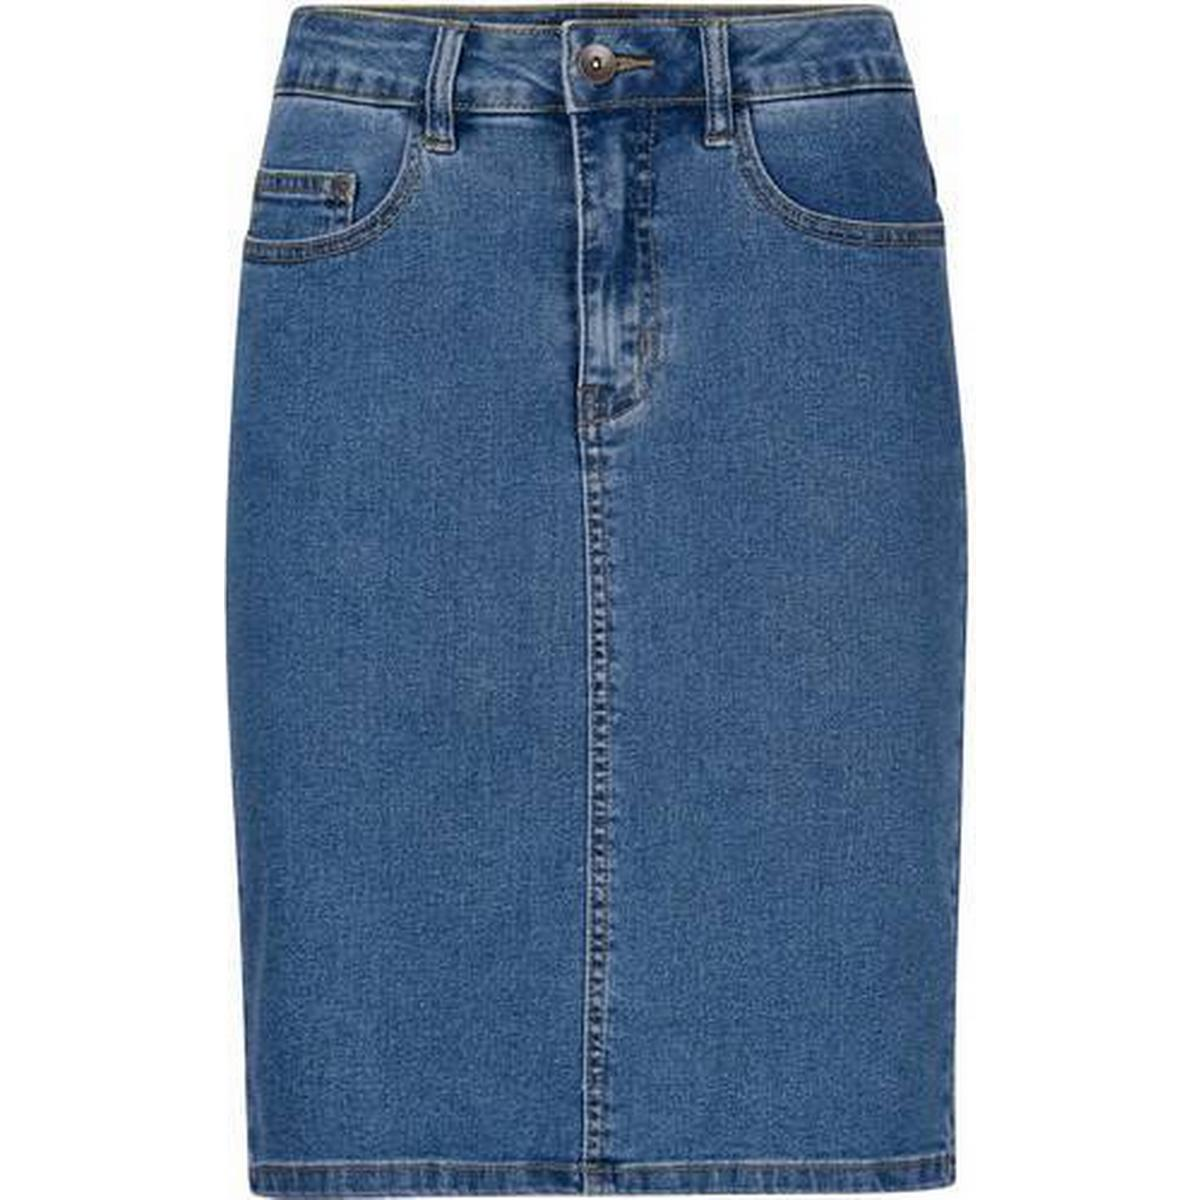 04935e19 Høj talje - Nederdele Dametøj - Sammenlign priser hos PriceRunner